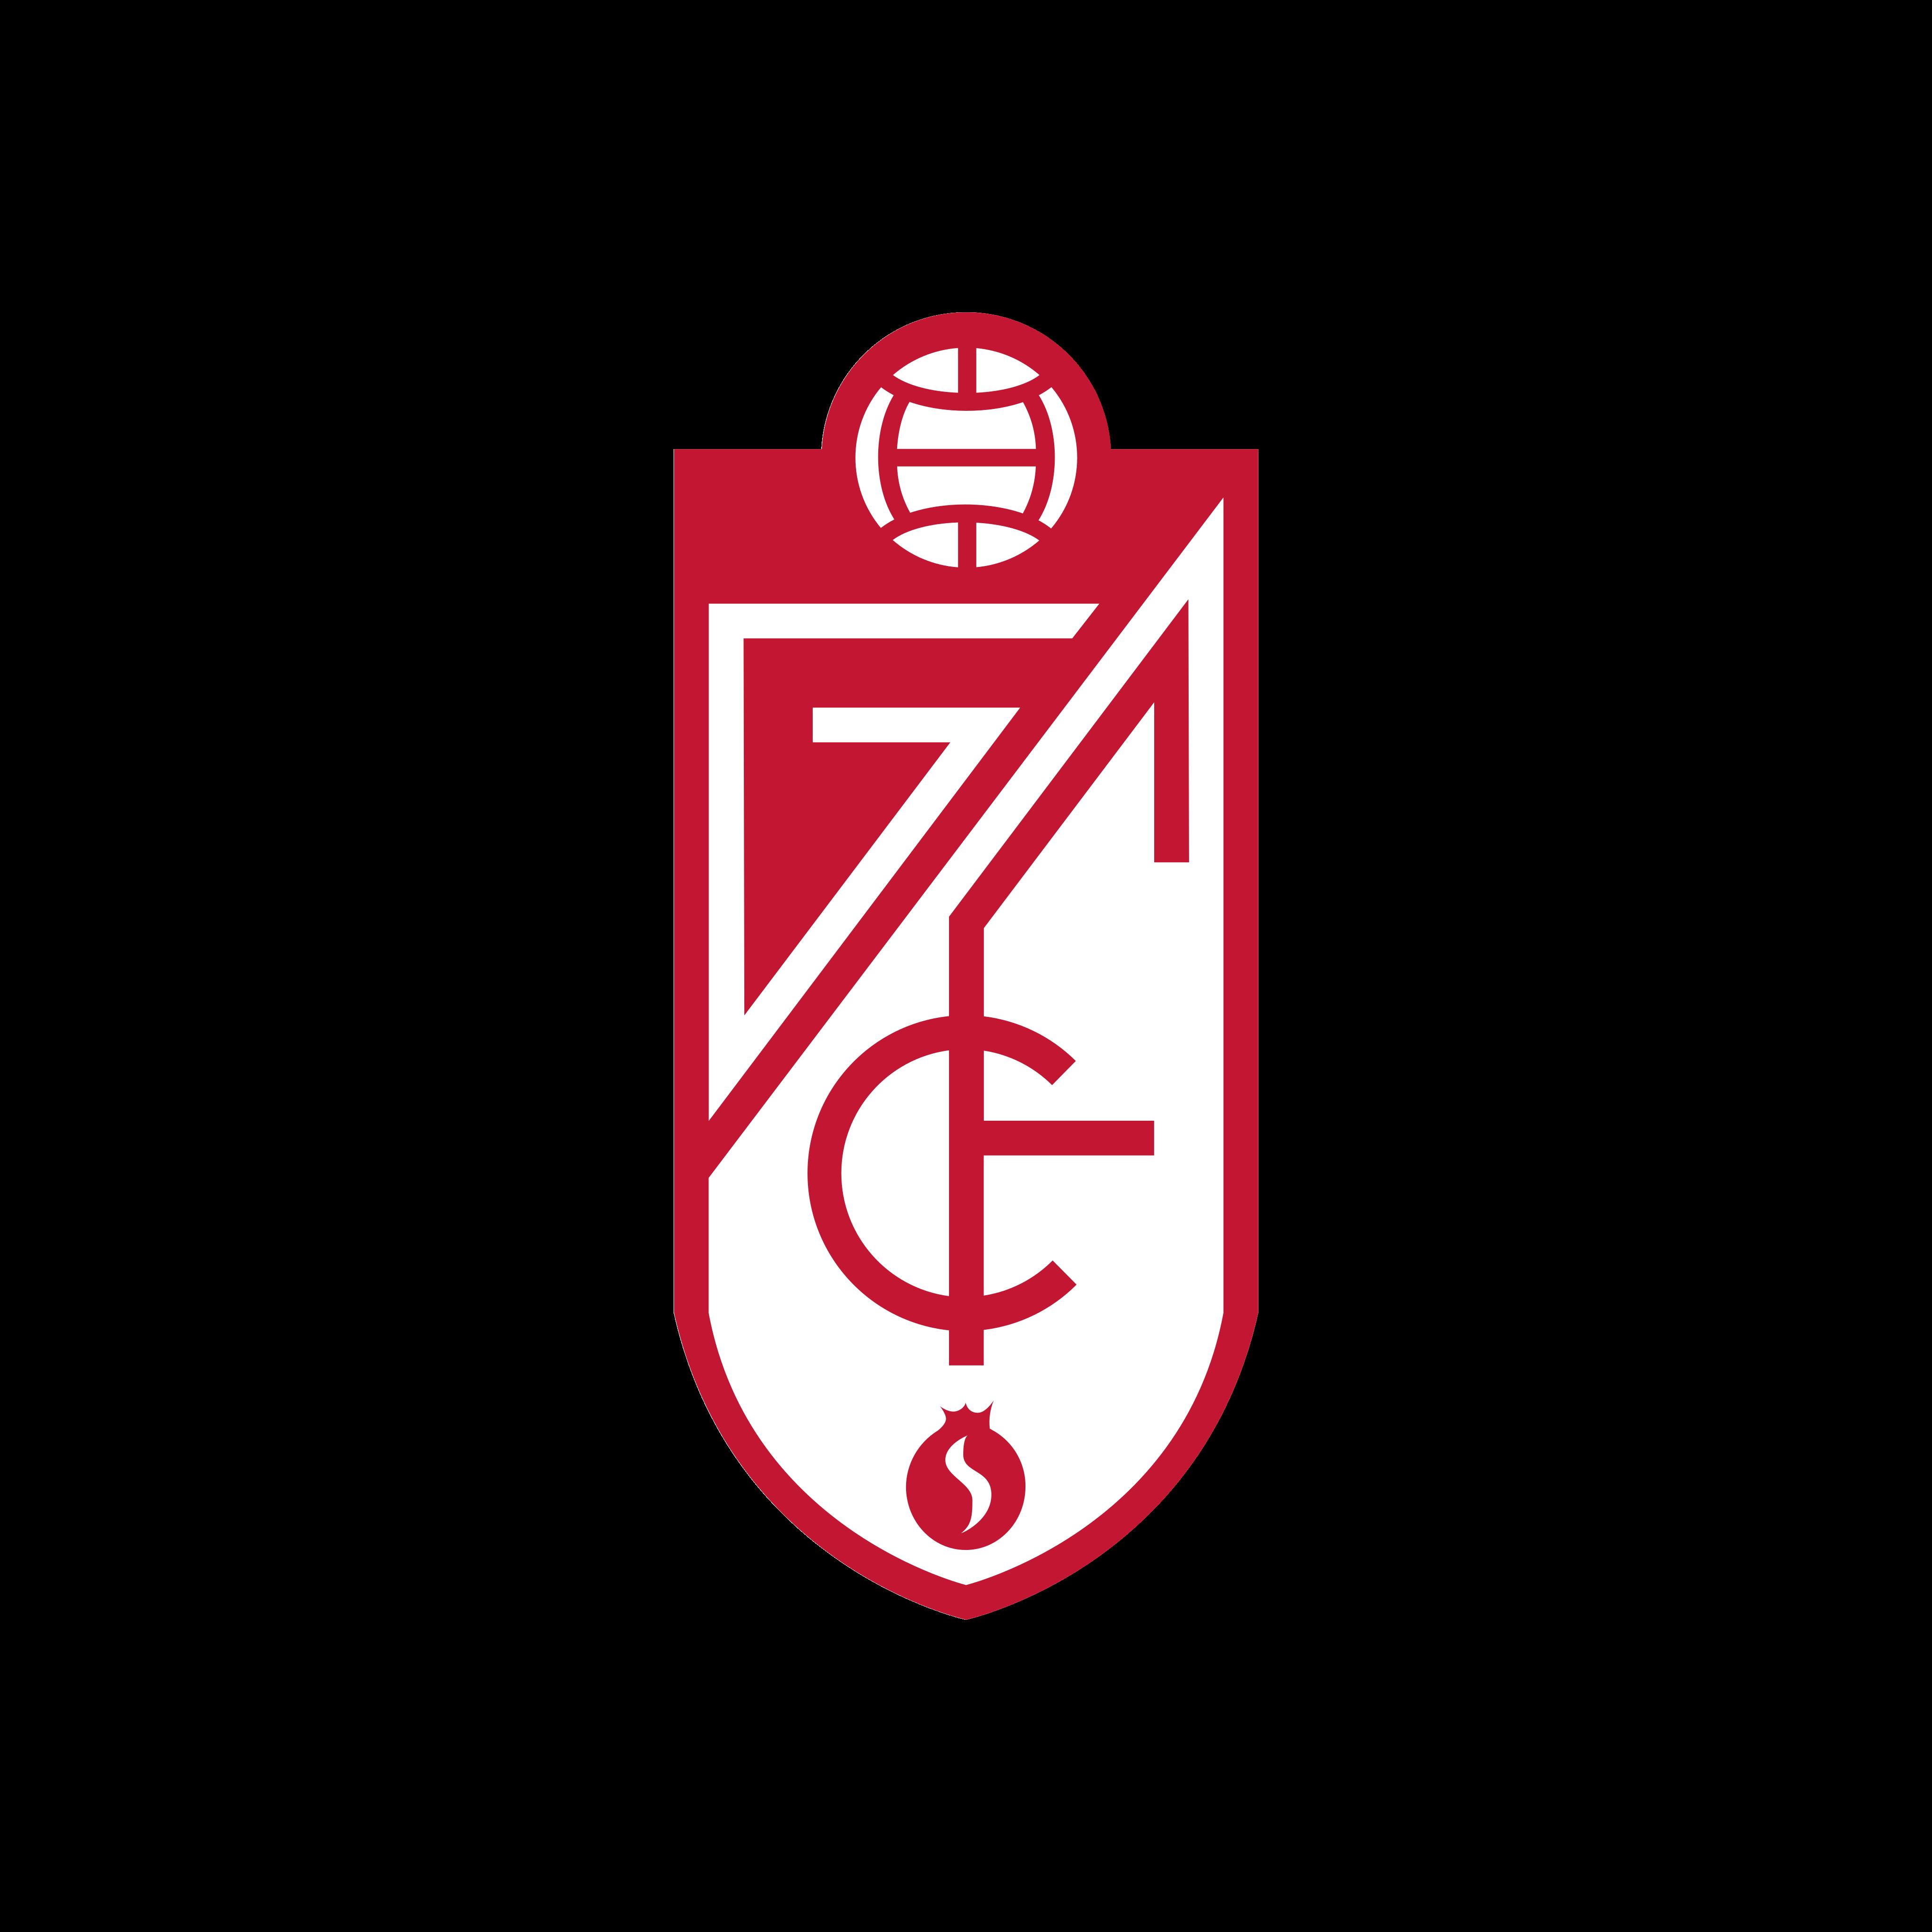 granada fc logo 0 - Granada FC Logo